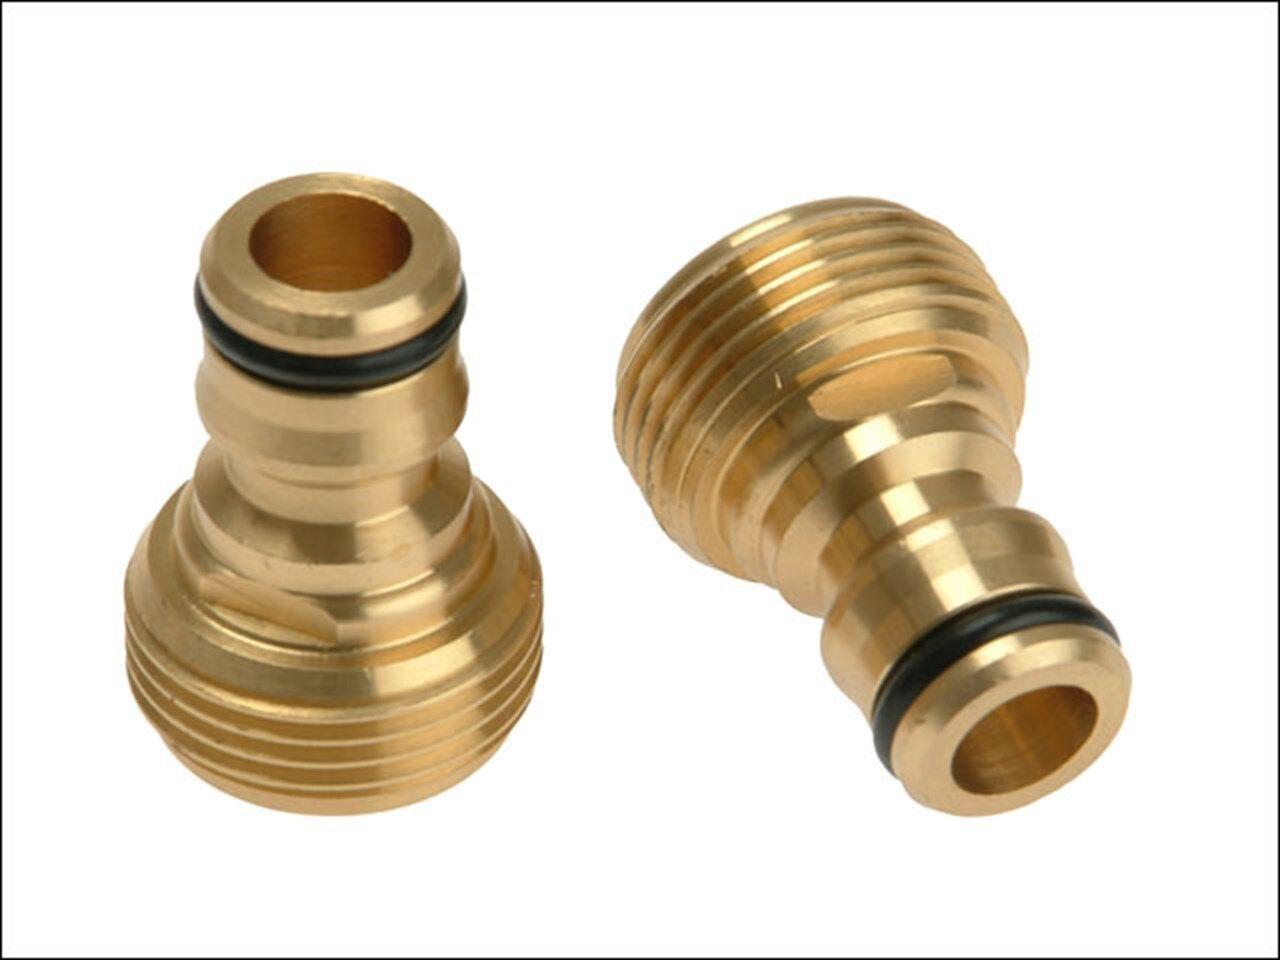 Rehau REH249596 Brass Tap Connector 3/4in - rustproof